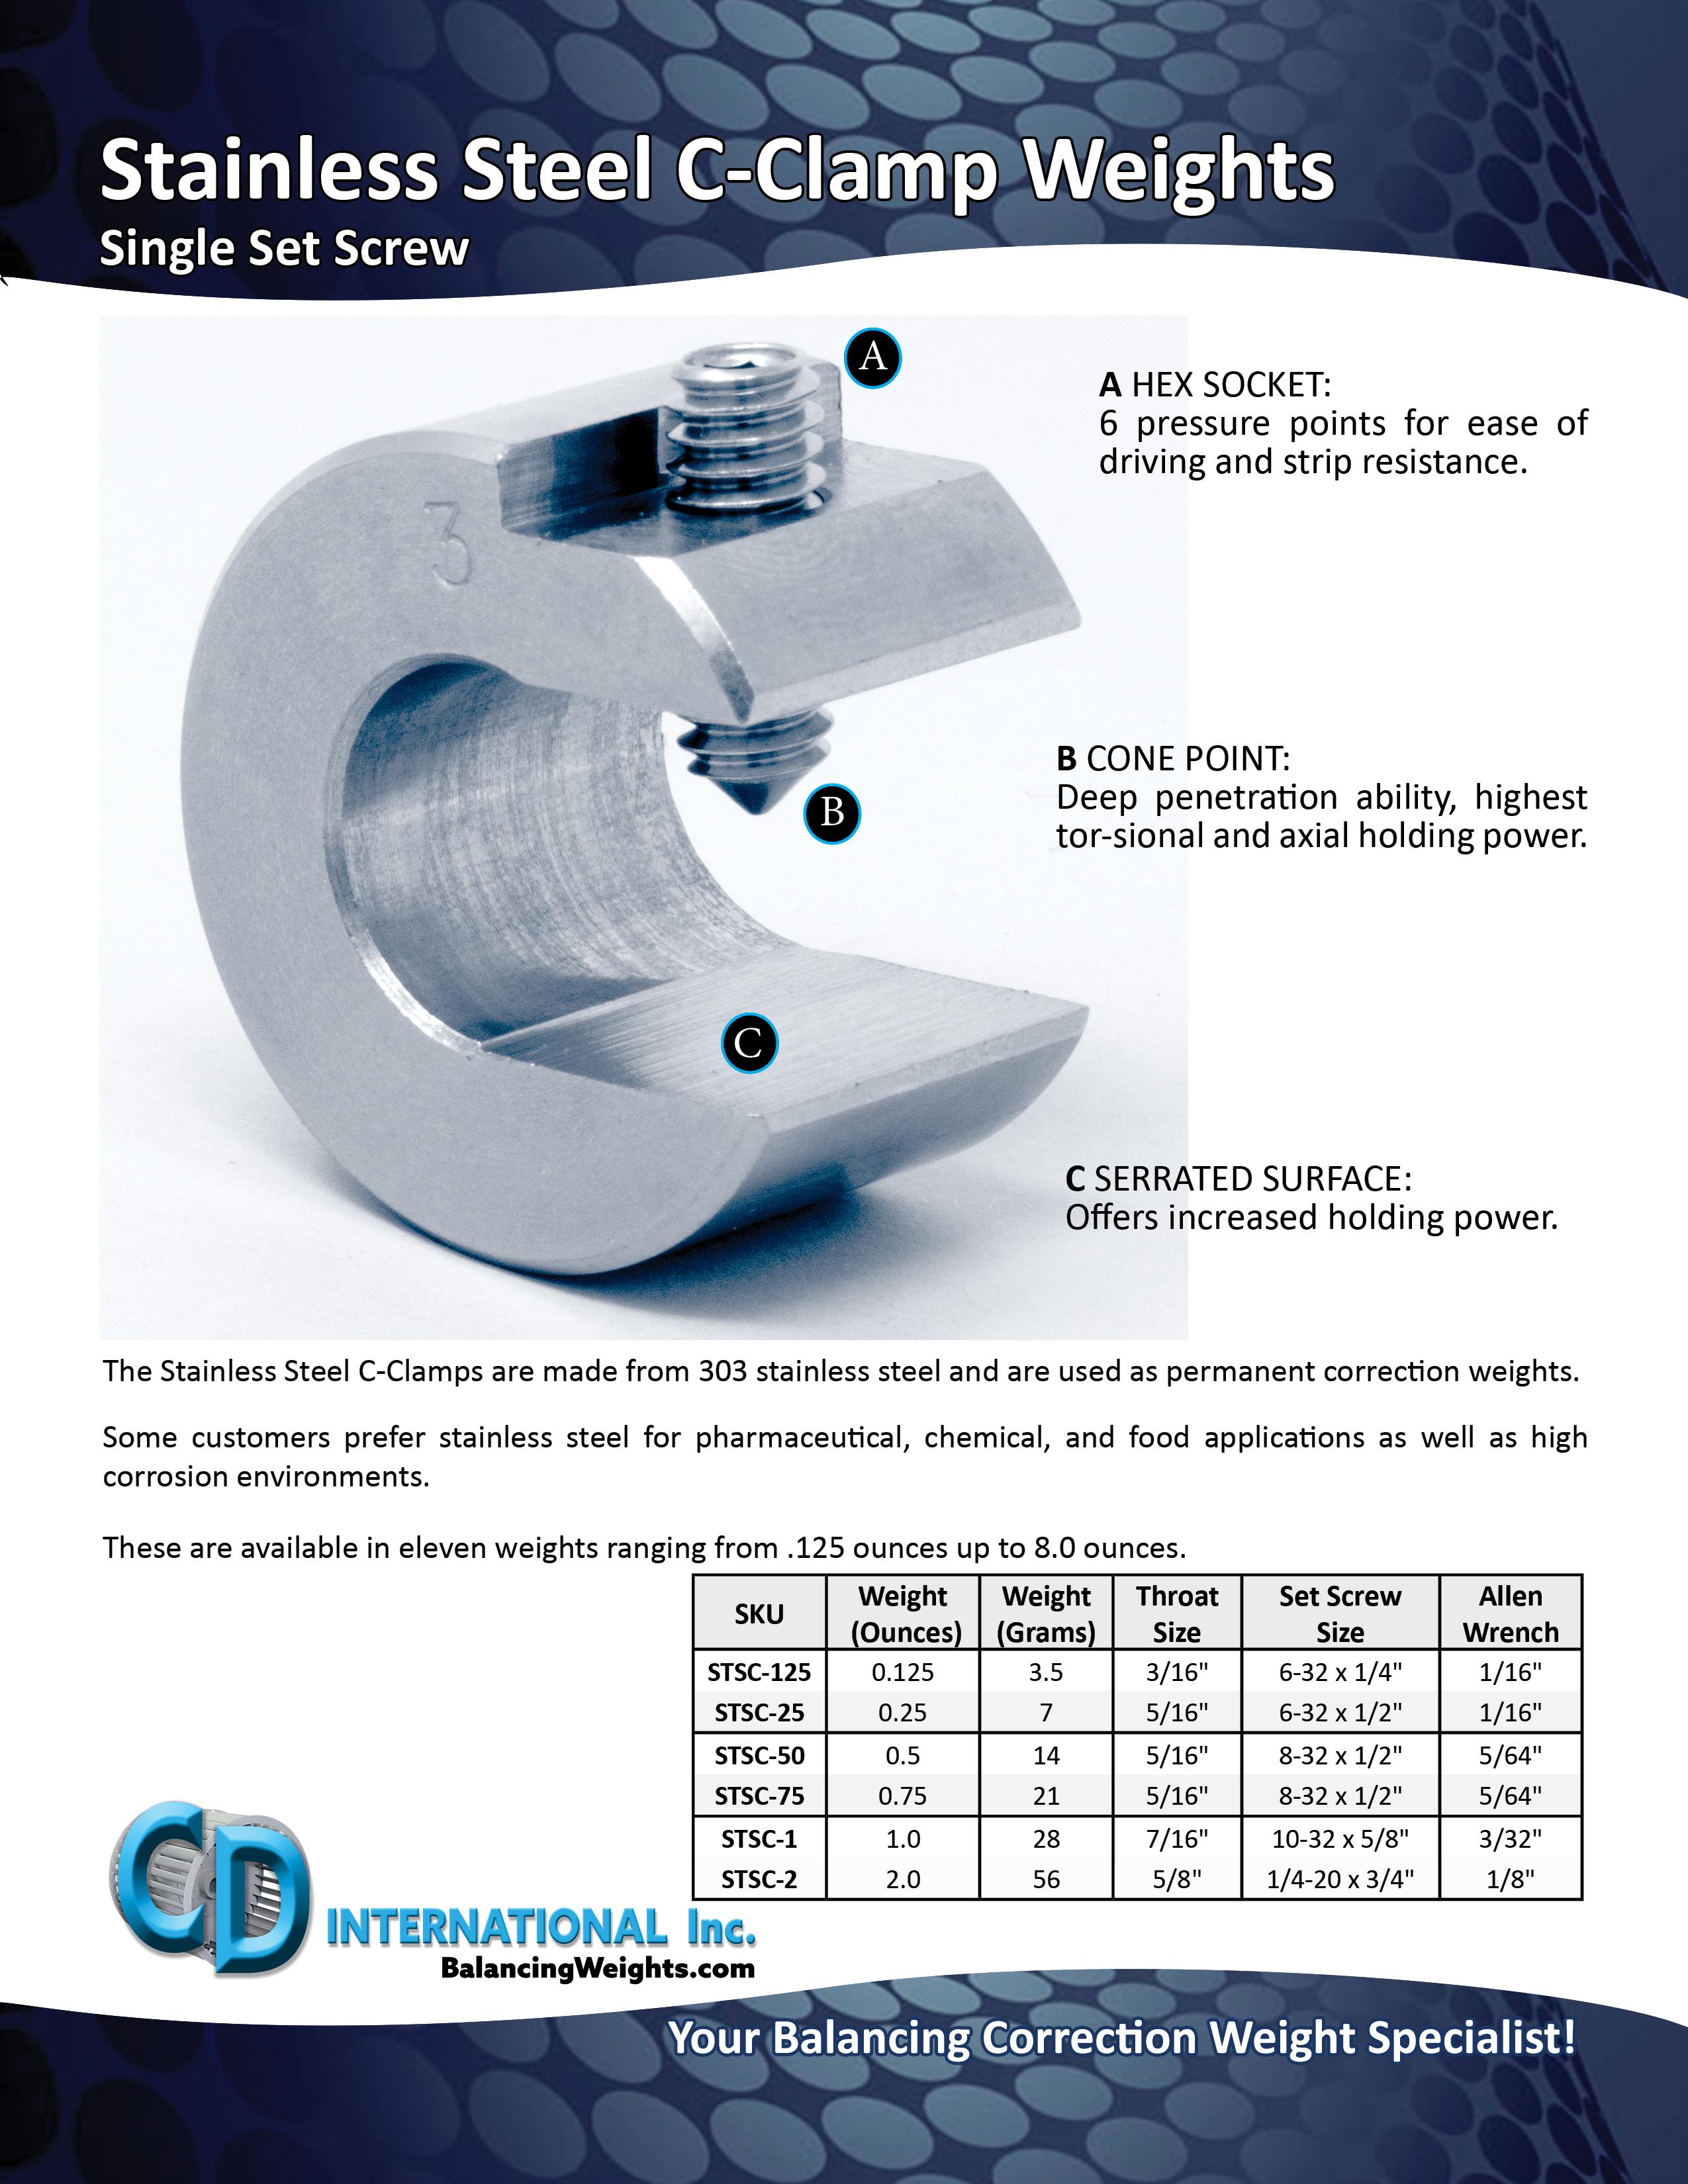 stsc-single-screw-c-clamp-spec-sheets.jpg